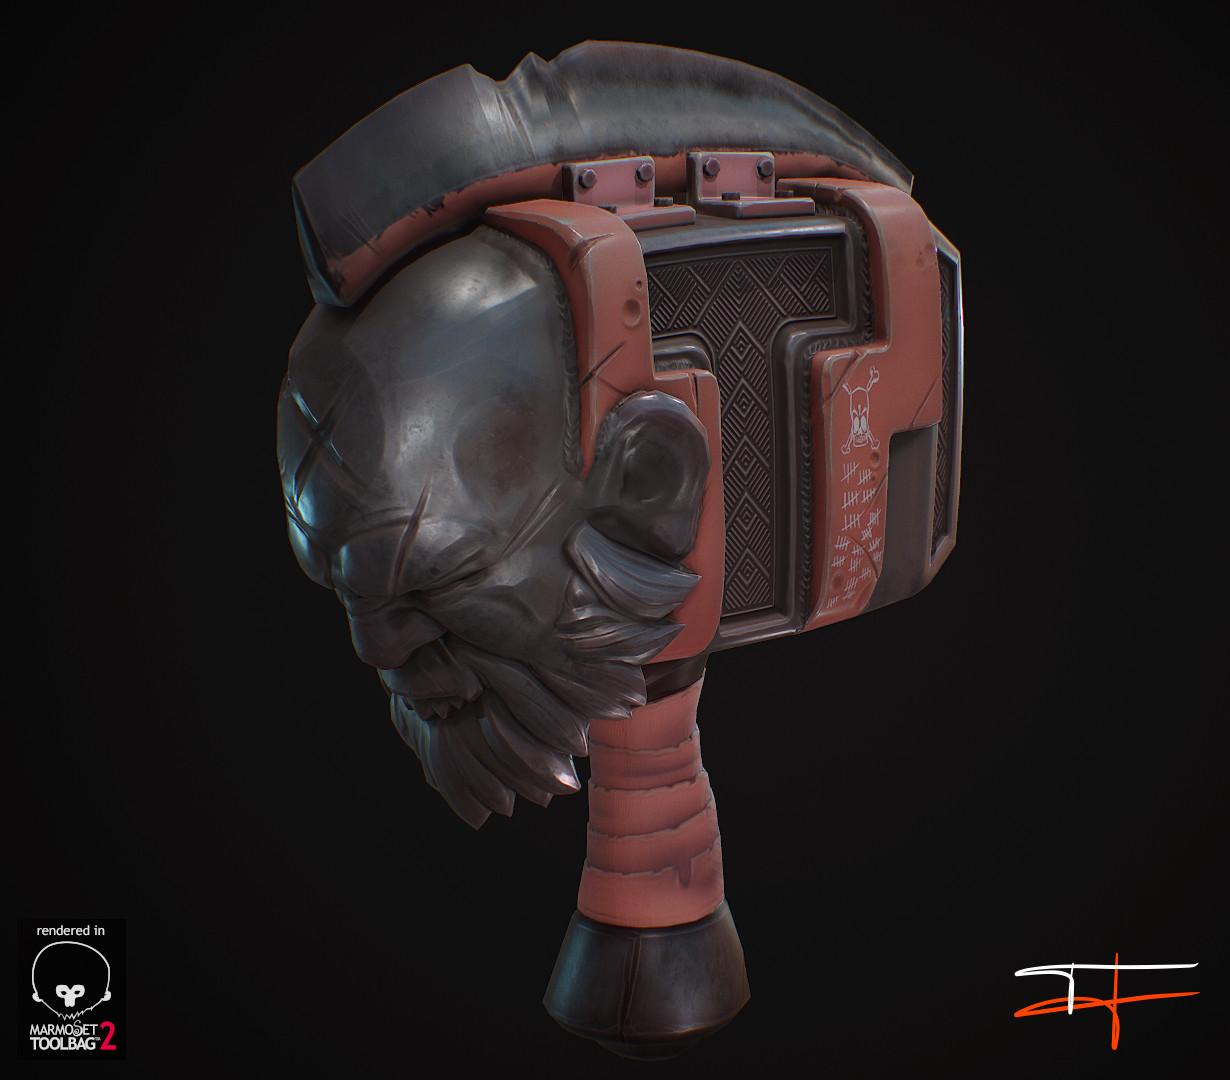 Tim jacksteit hammer shot002